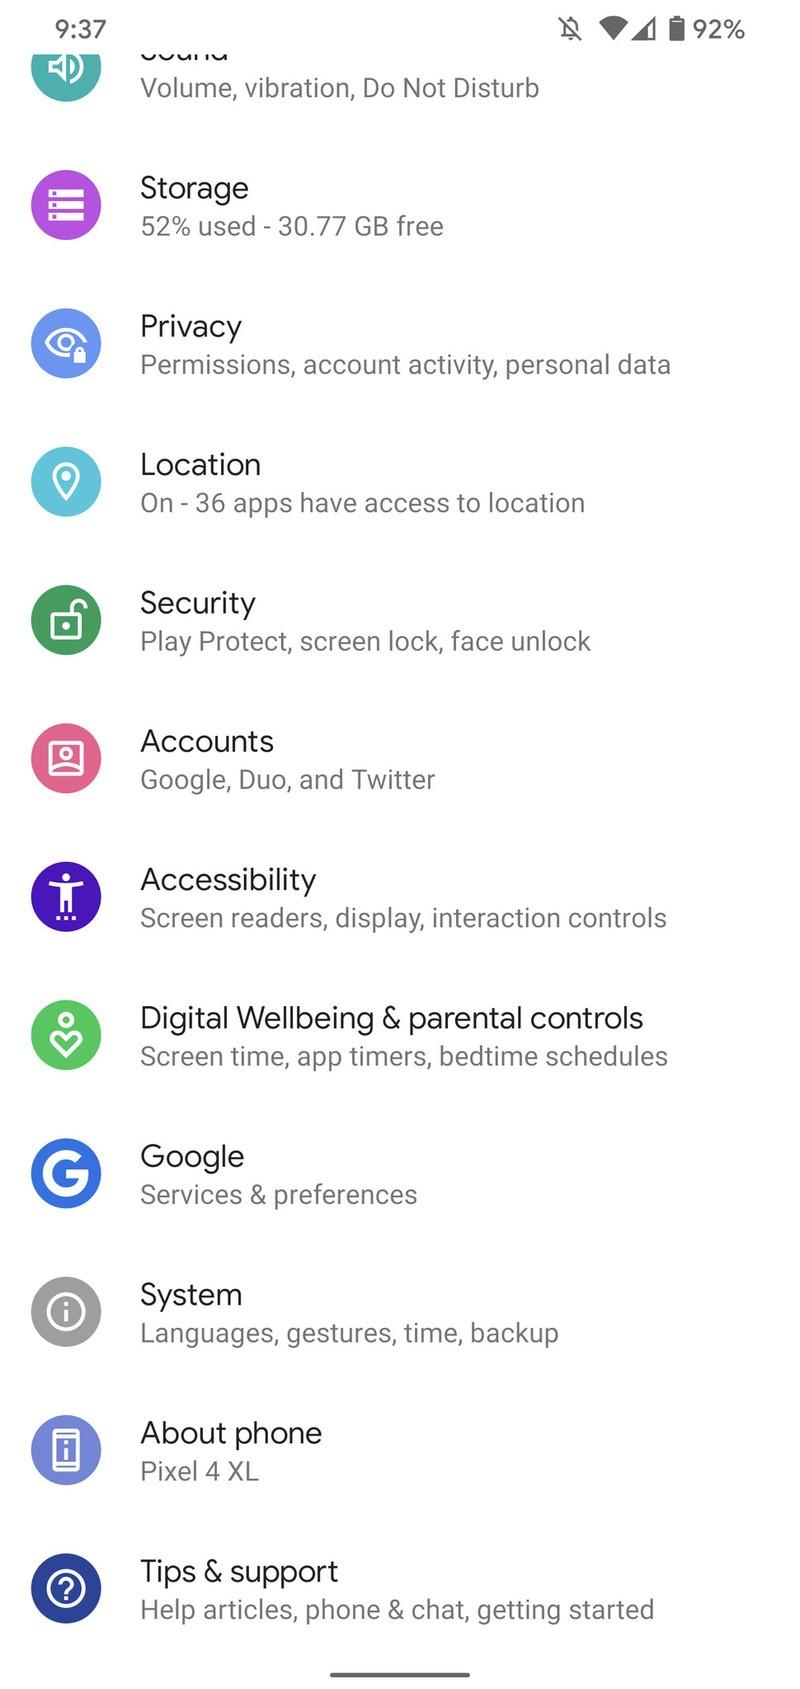 chuyen danh ba tu iphone sang android 1